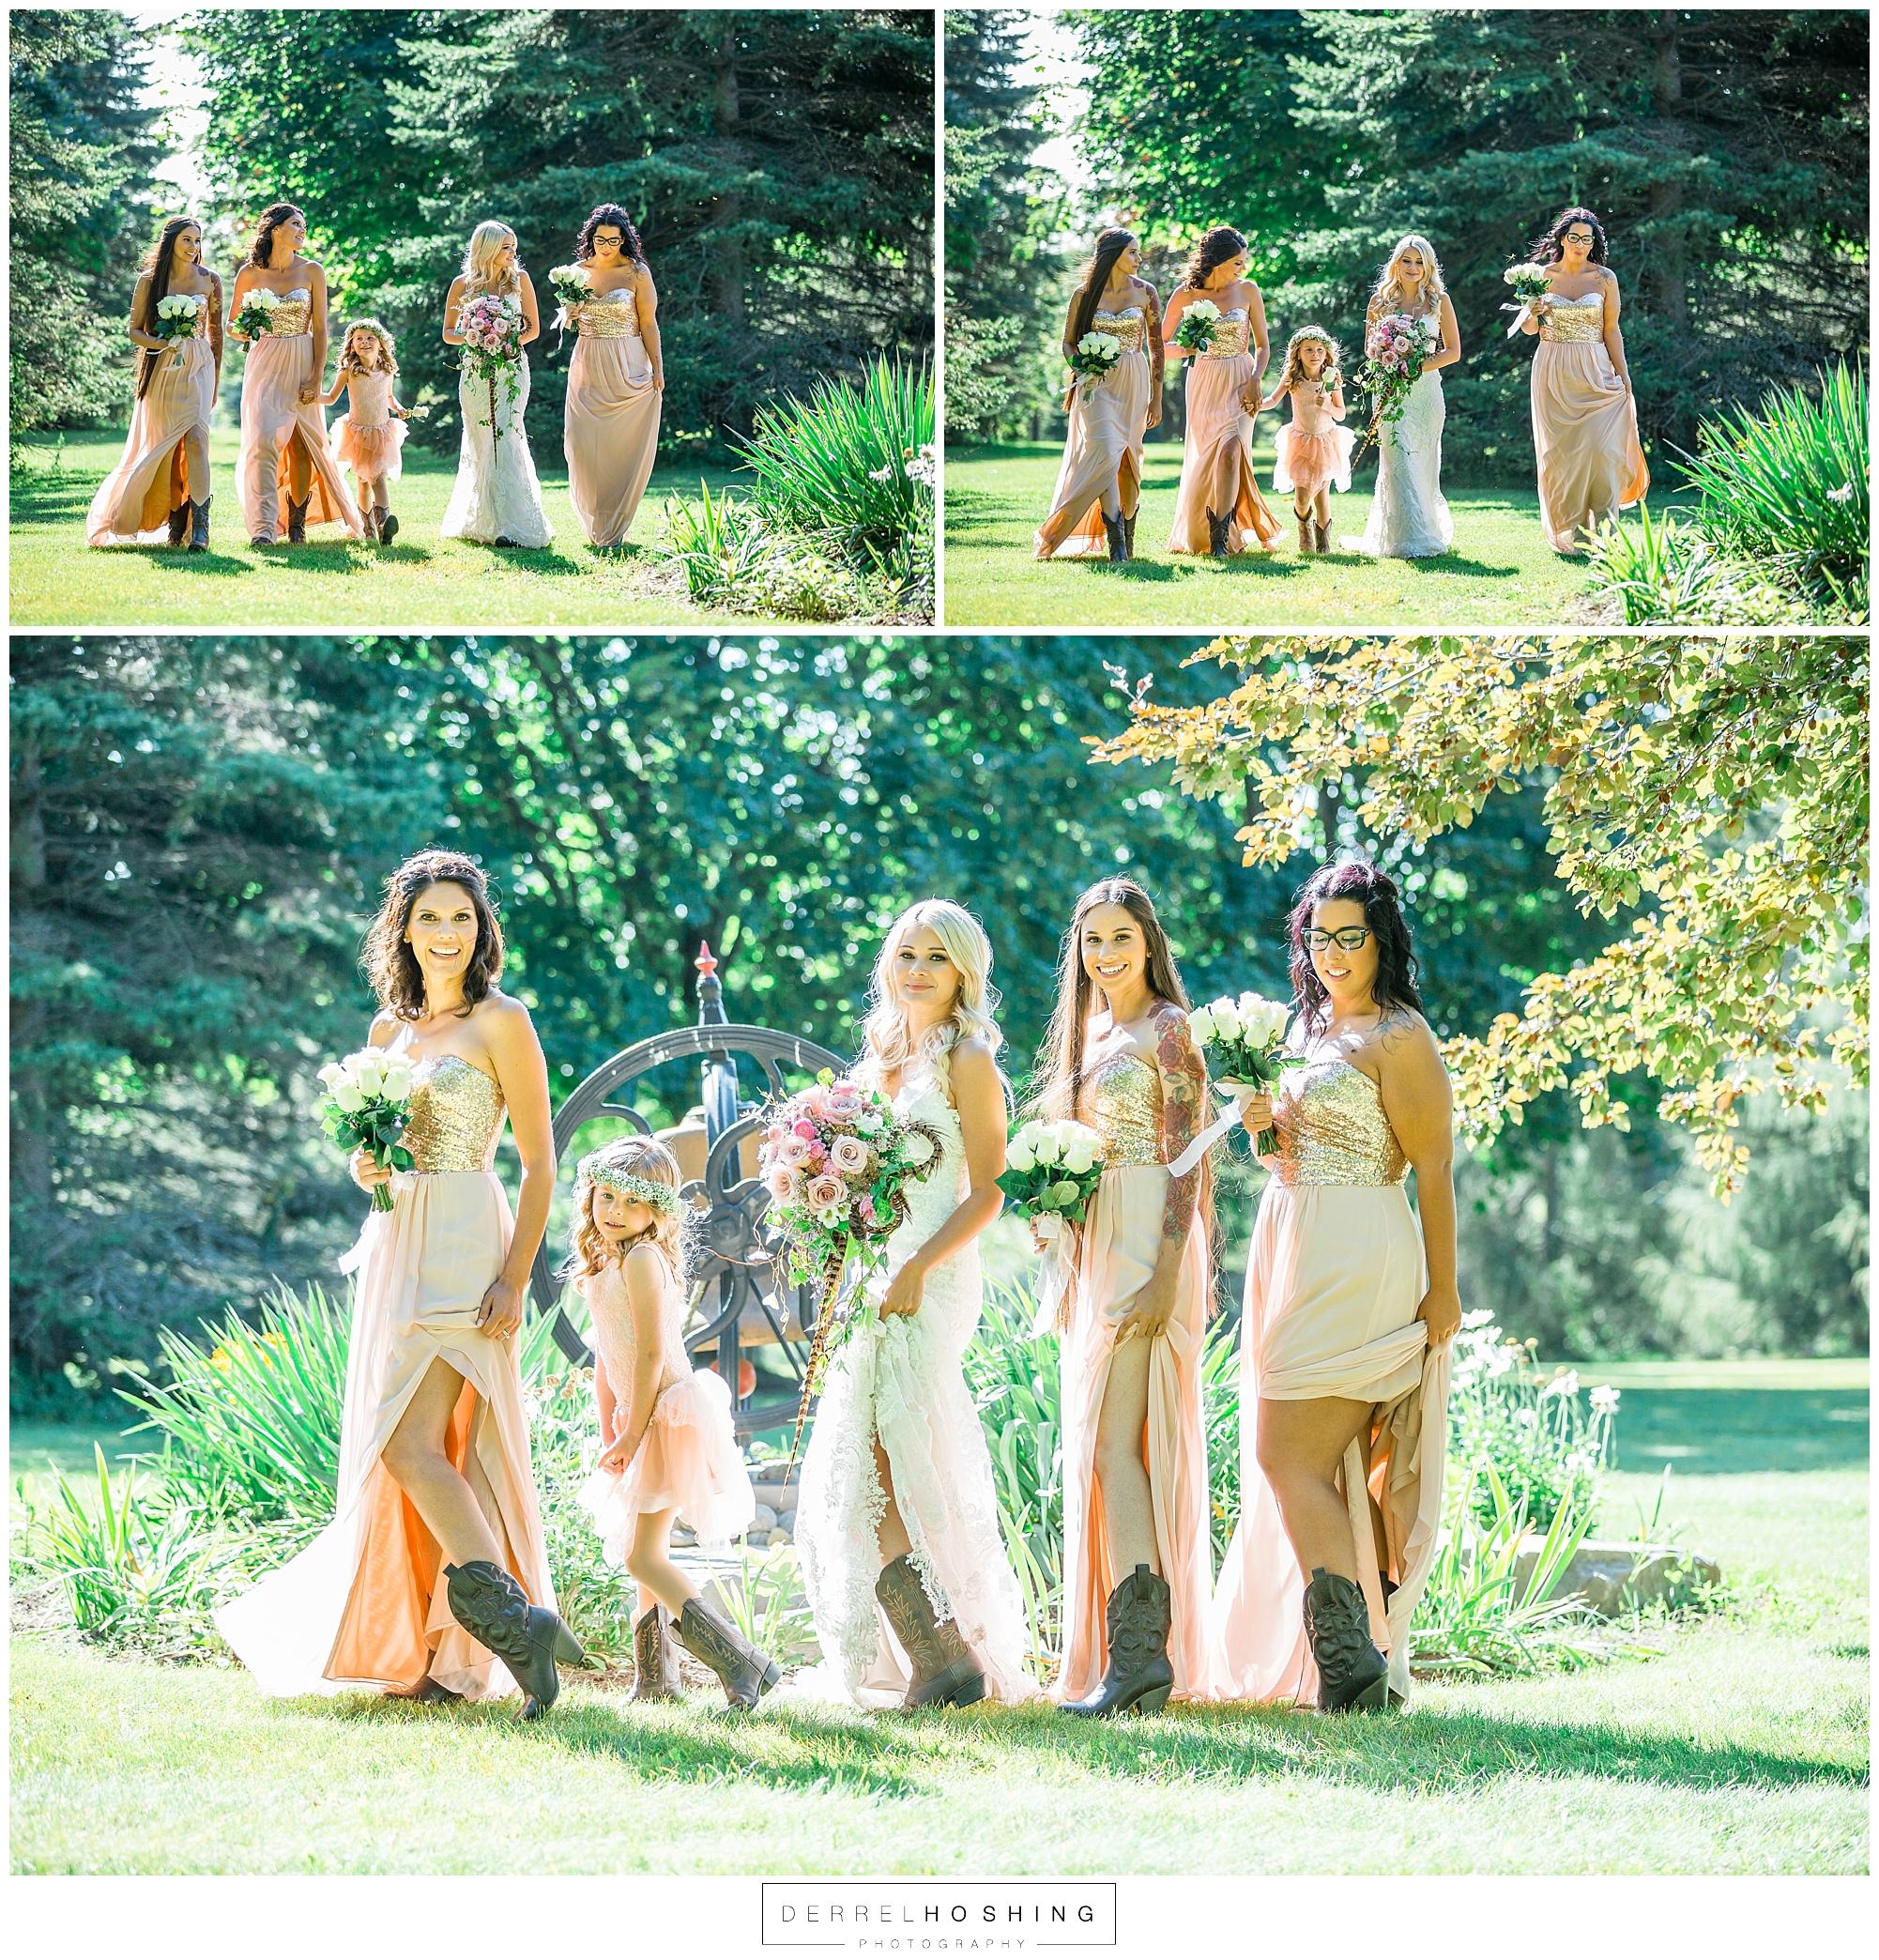 Belcroft-Estates-&-Event-Centre-Wedding-Innisfil-Ontario-0012.jpg